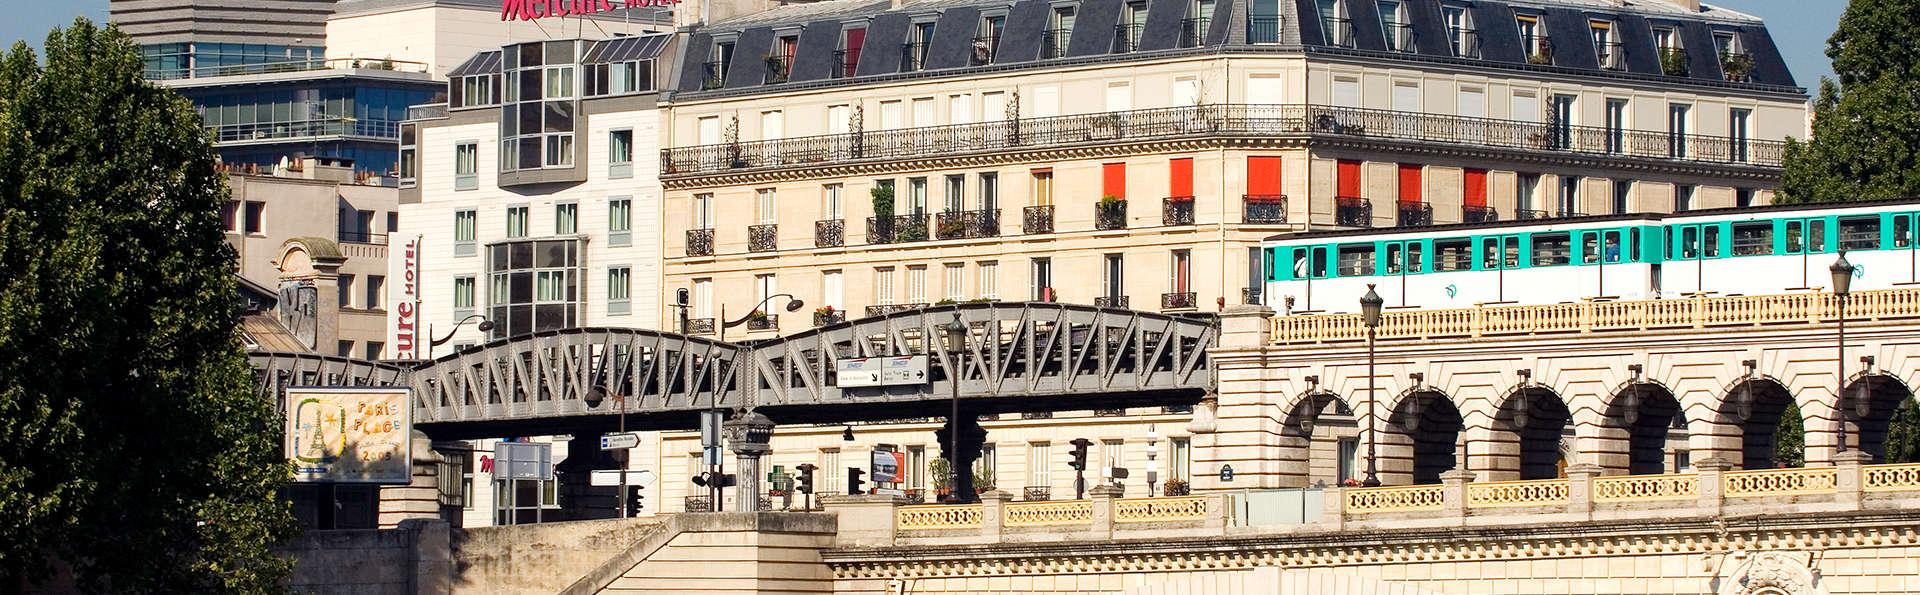 Mercure Paris Bercy Bibliothèque - edit_front2.jpg